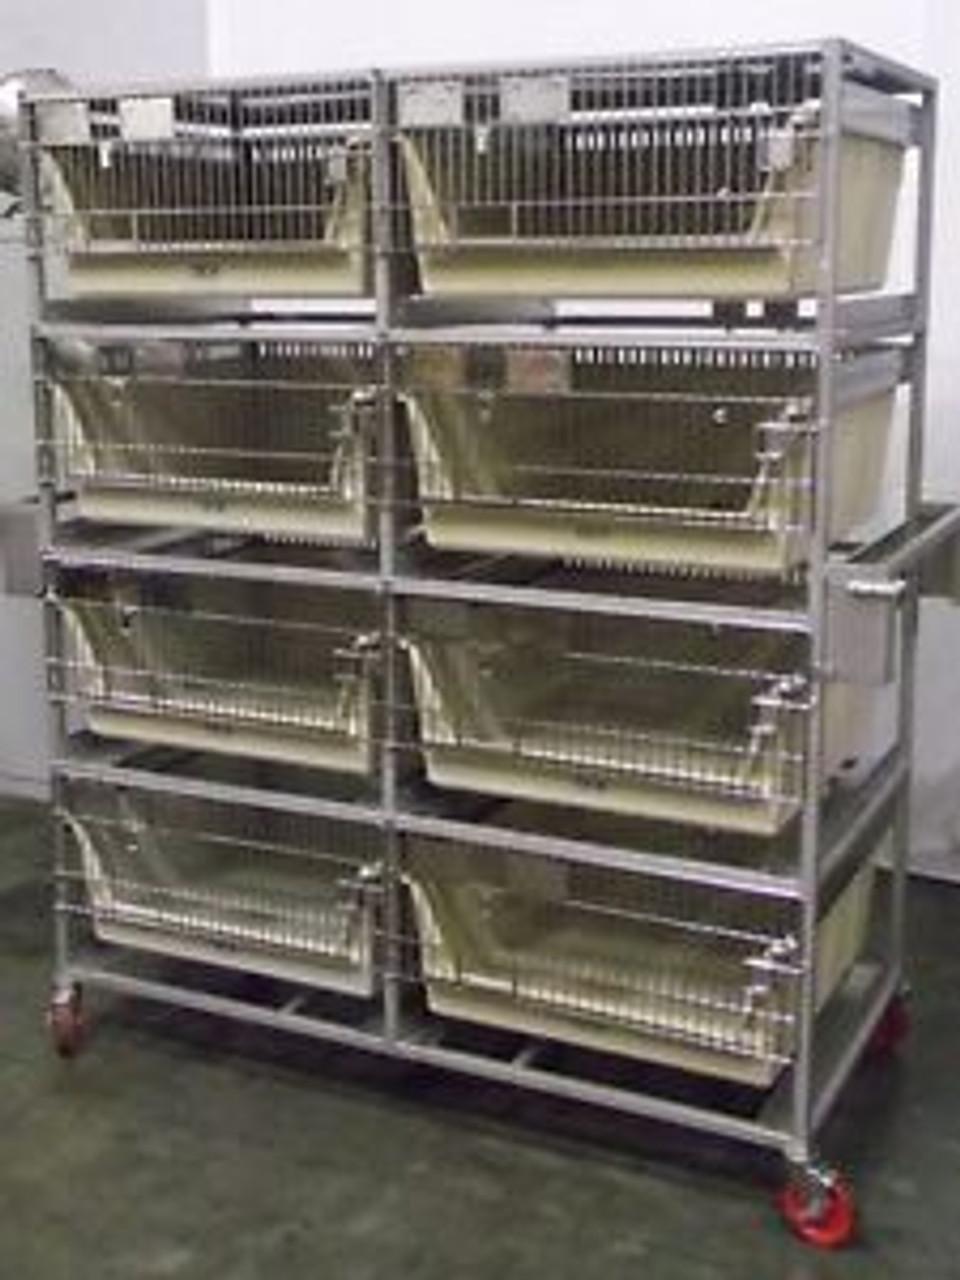 S124765 Allentown Caging Equipment 8 Rack Lab Veterinary Rabbit/Guinea Pig  Cage